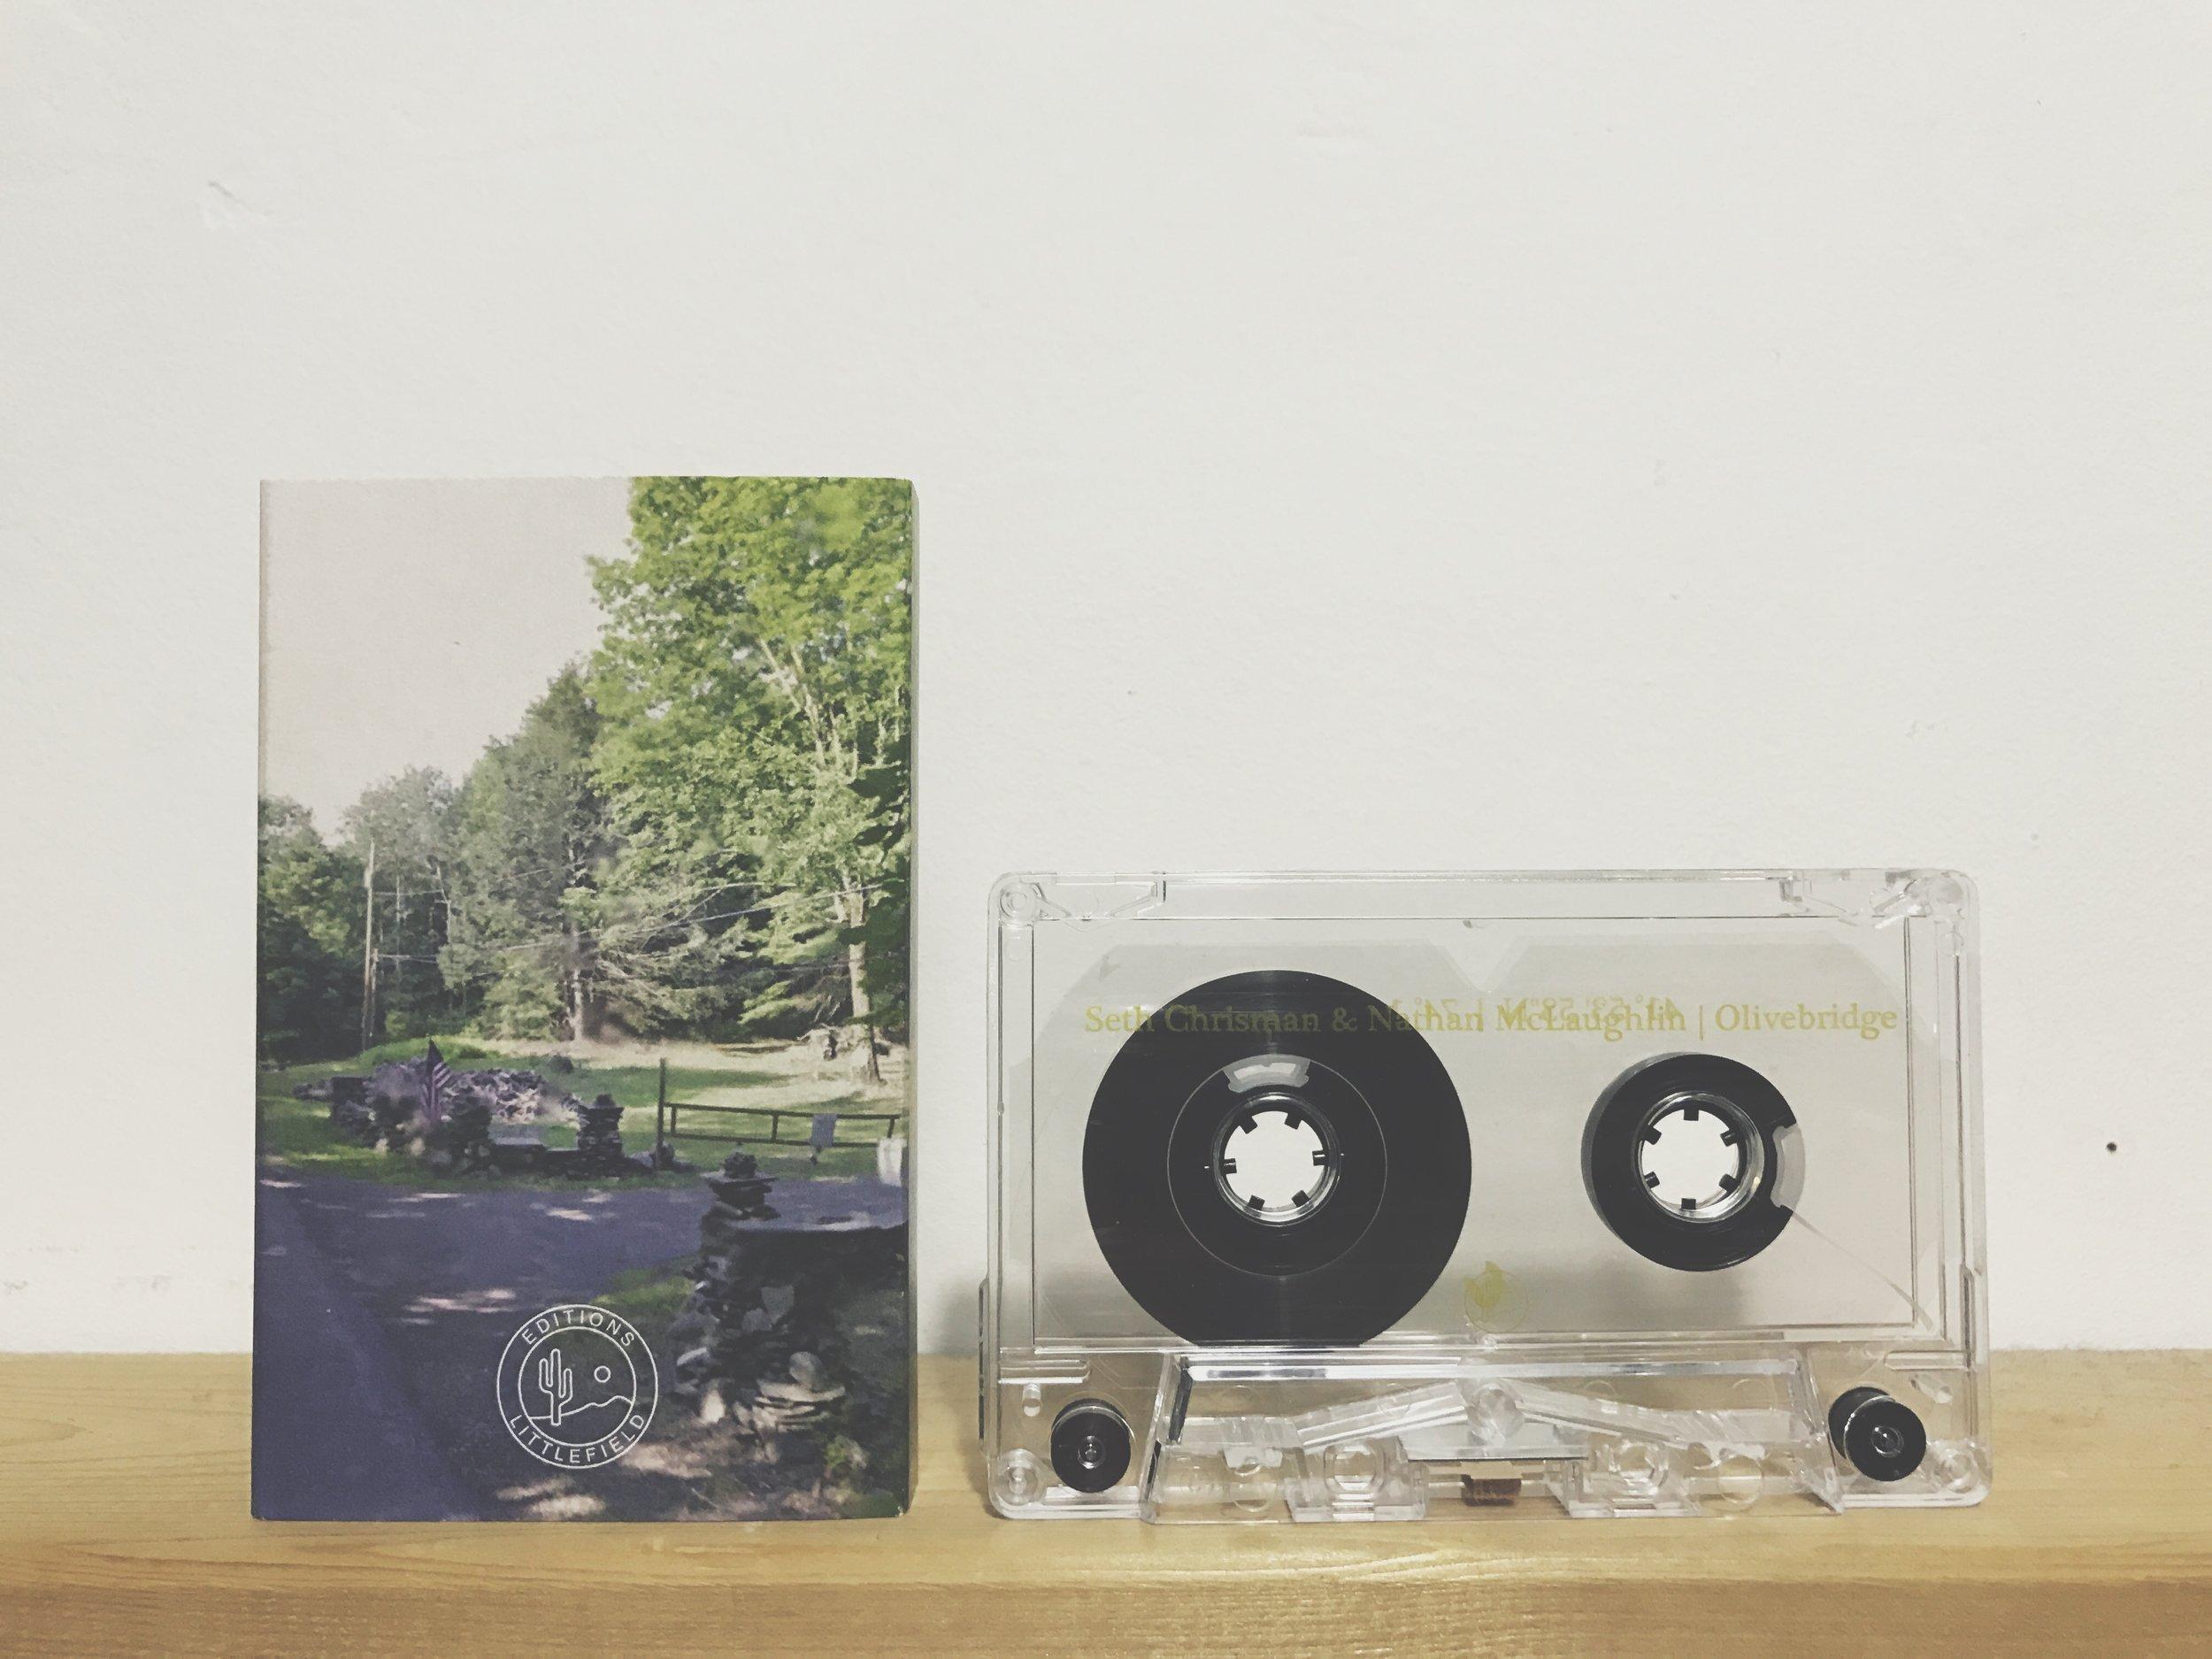 Seth Chrisman & Nathan McLaughlin - Olivebridge (Editions Littlefield)